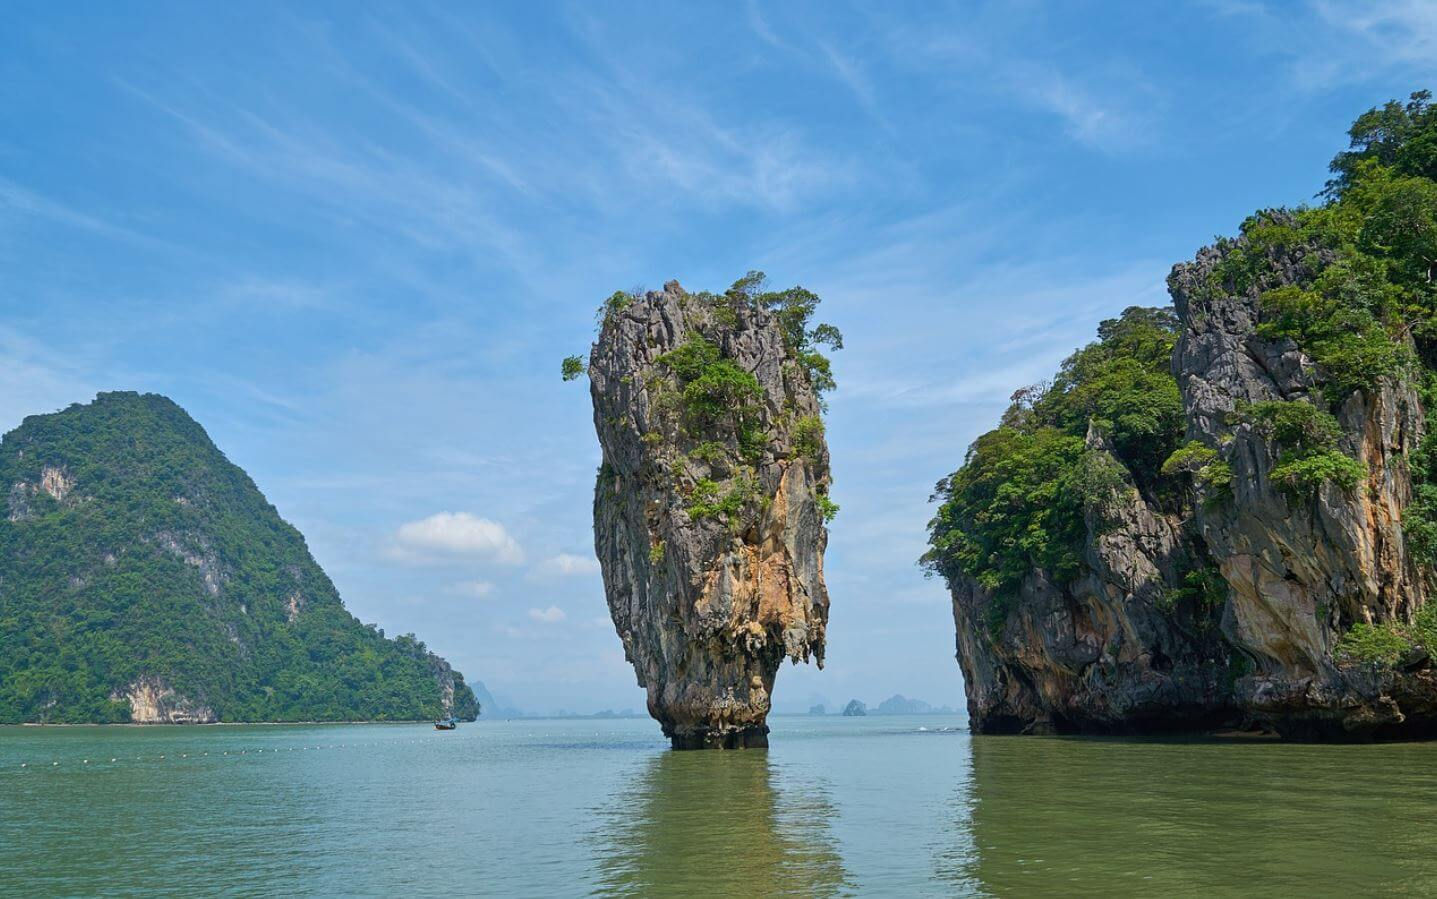 Landschaft Asien